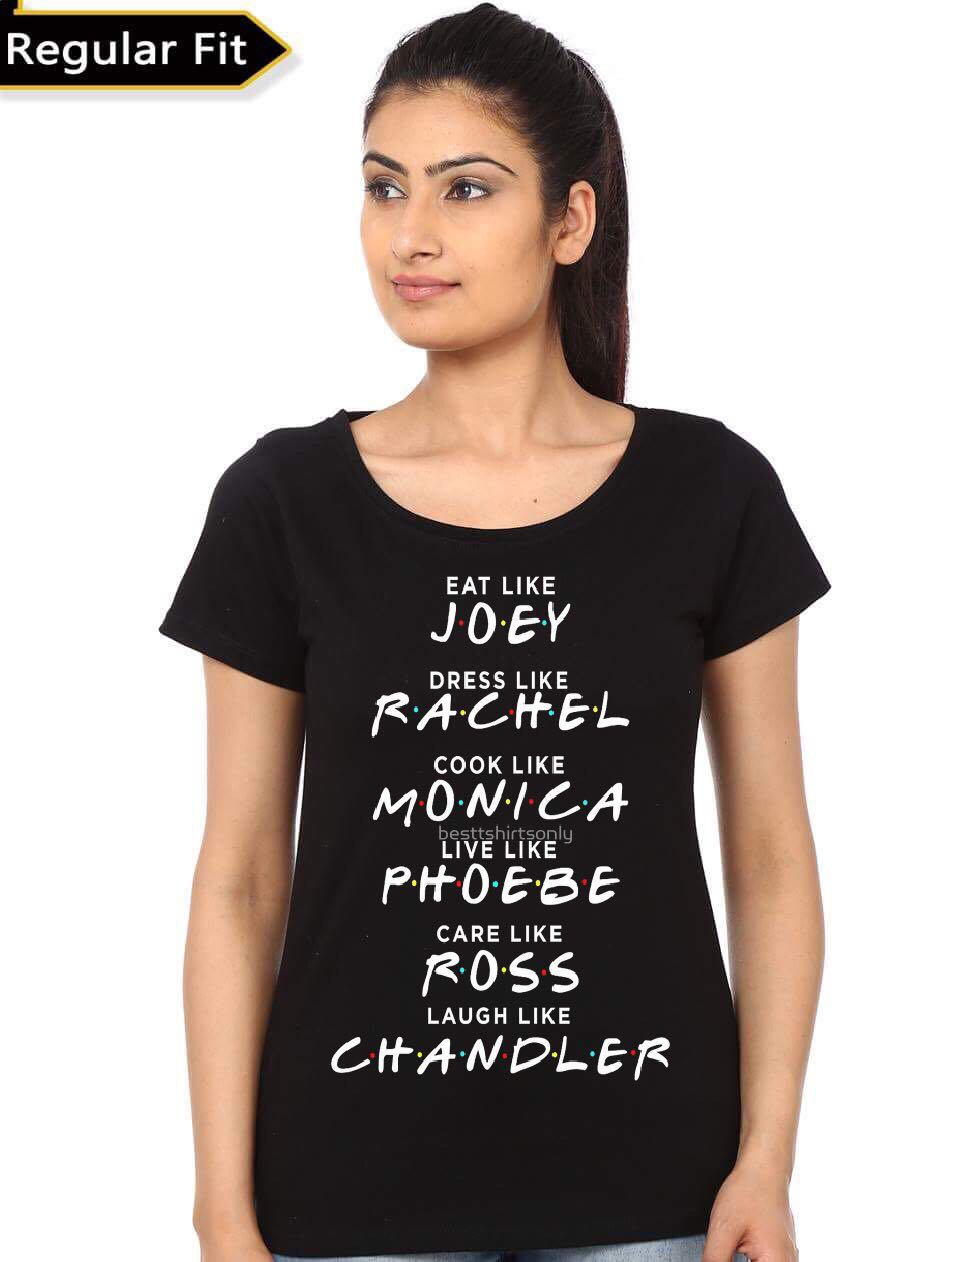 Black t shirt girl - Black T Shirt Girl 47